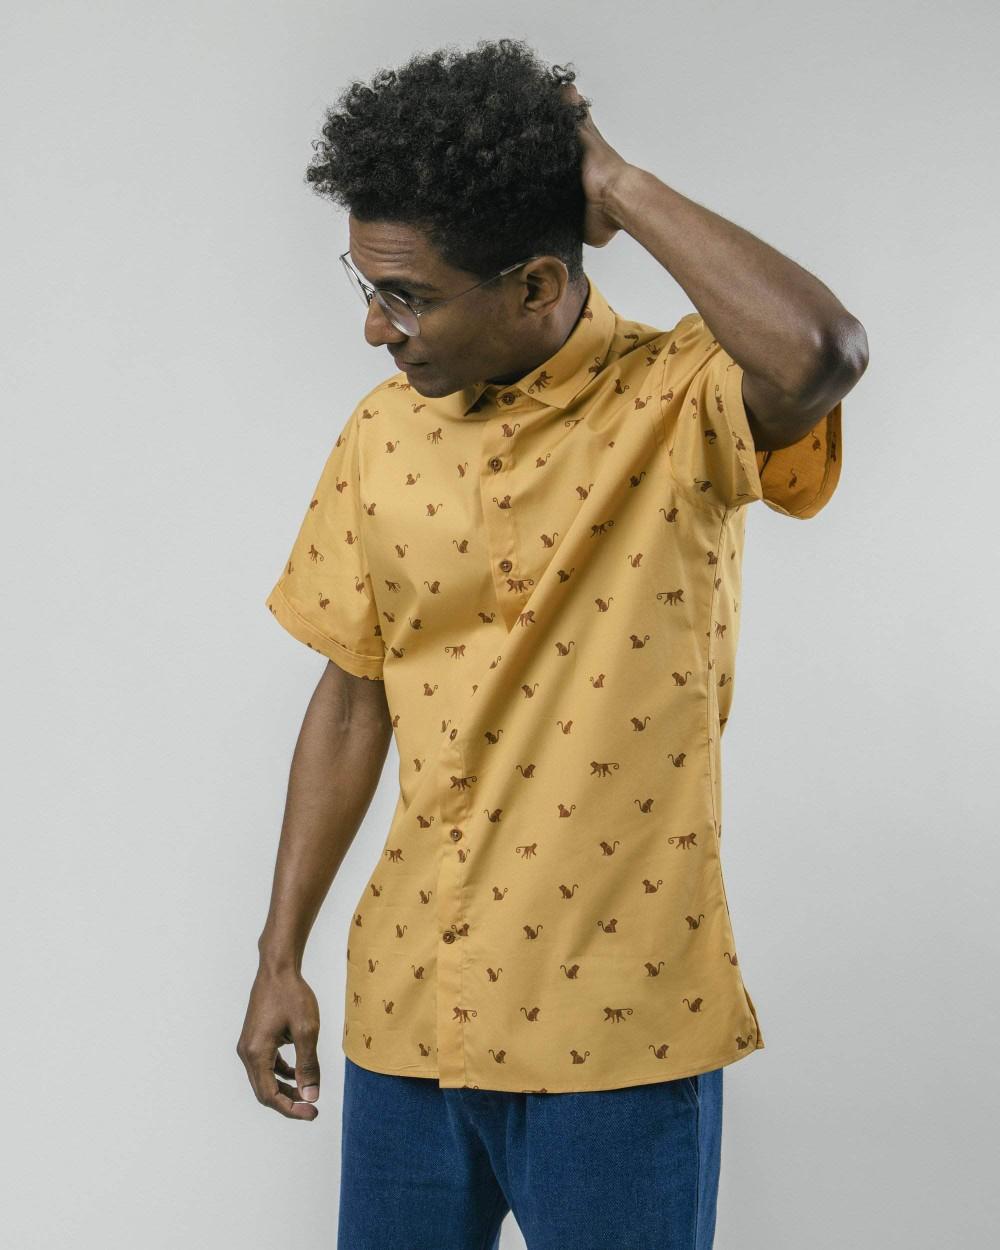 Monkey monkey printed shirt - Brava Fabrics